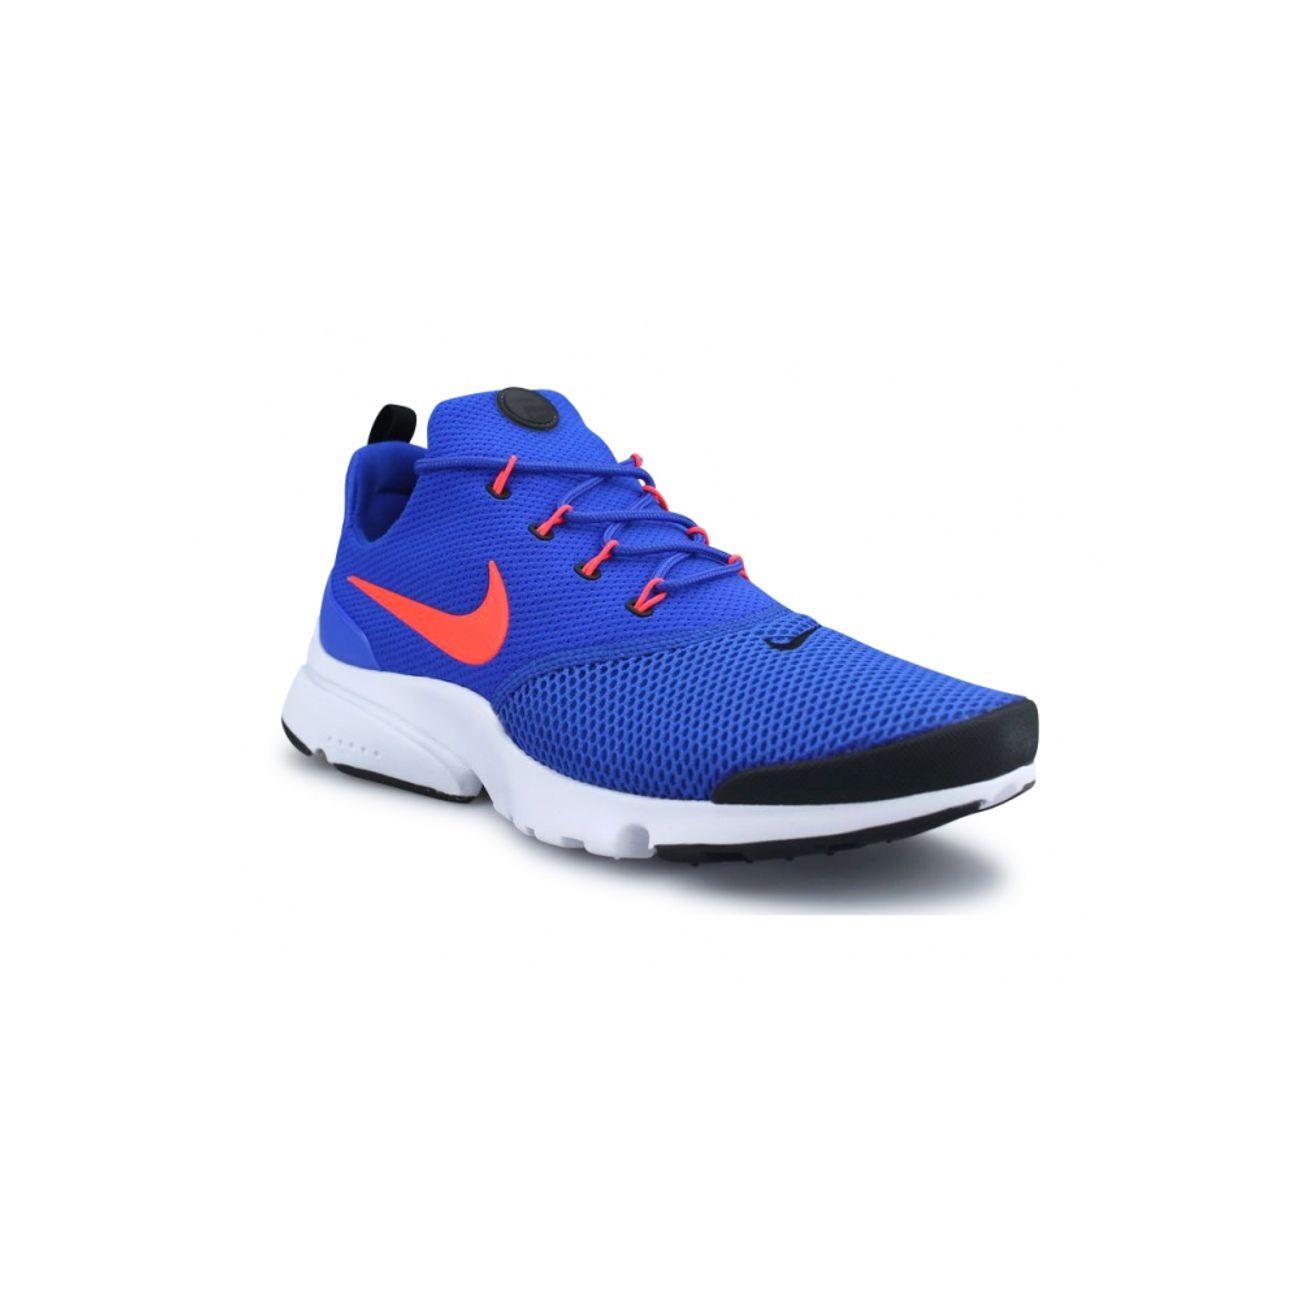 Fly Bleu 405 908019 ModeLifestyle Presto Homme Nike Basket DIEH9e2YW